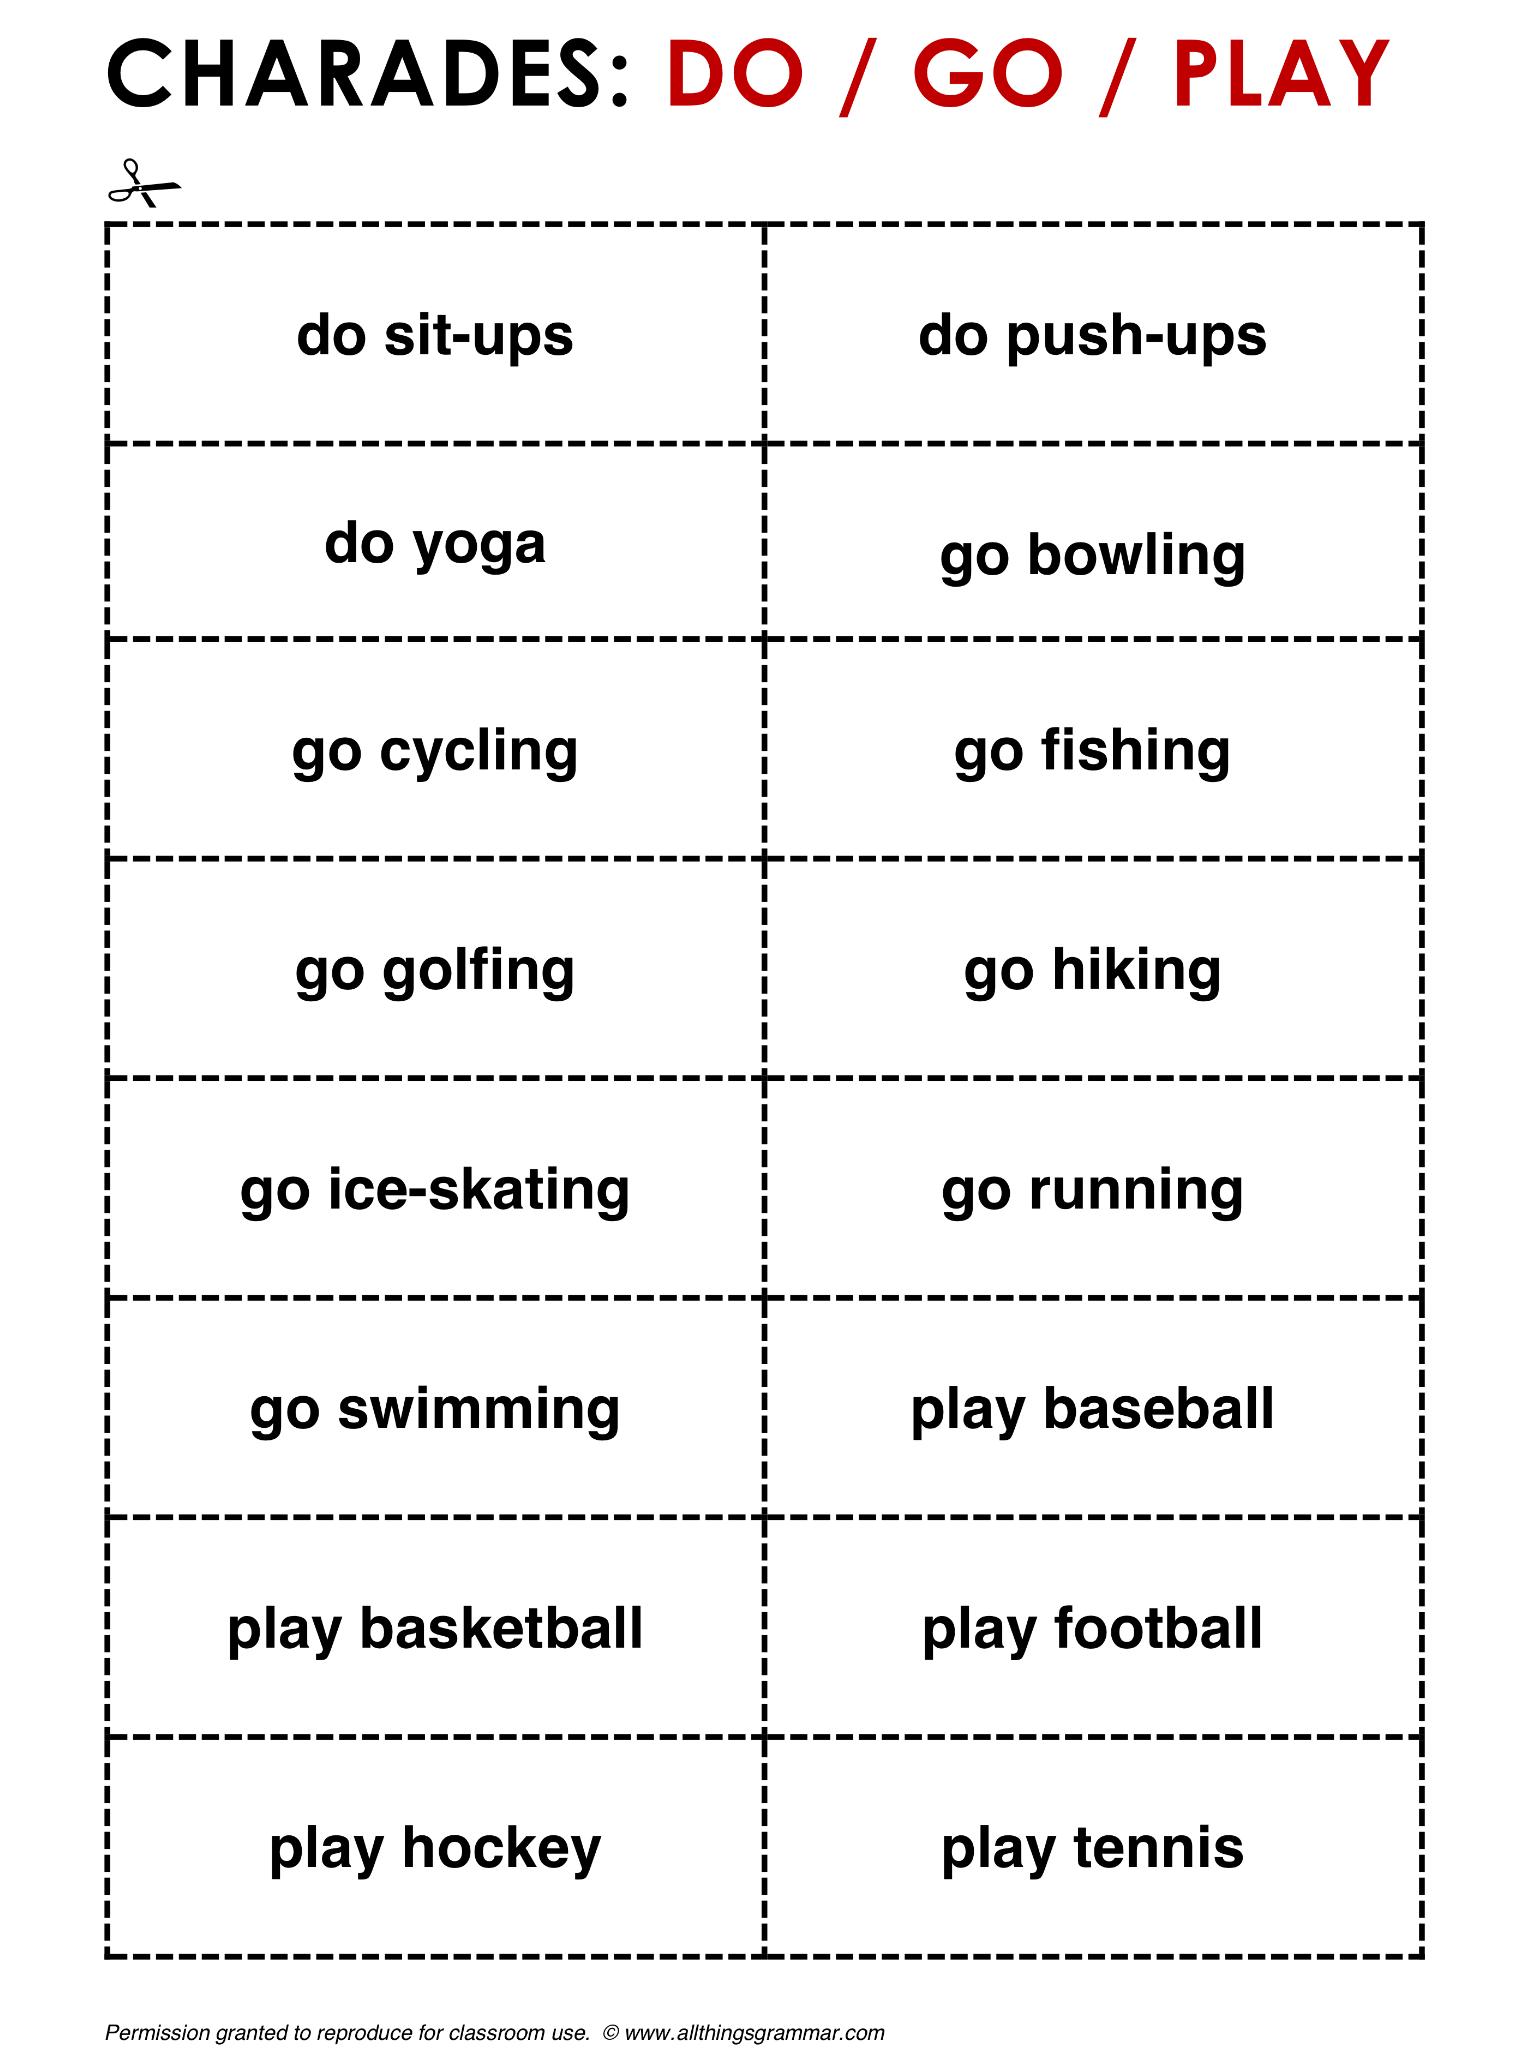 English Grammar Do Go Play Lthingsgrammar Do Go Play